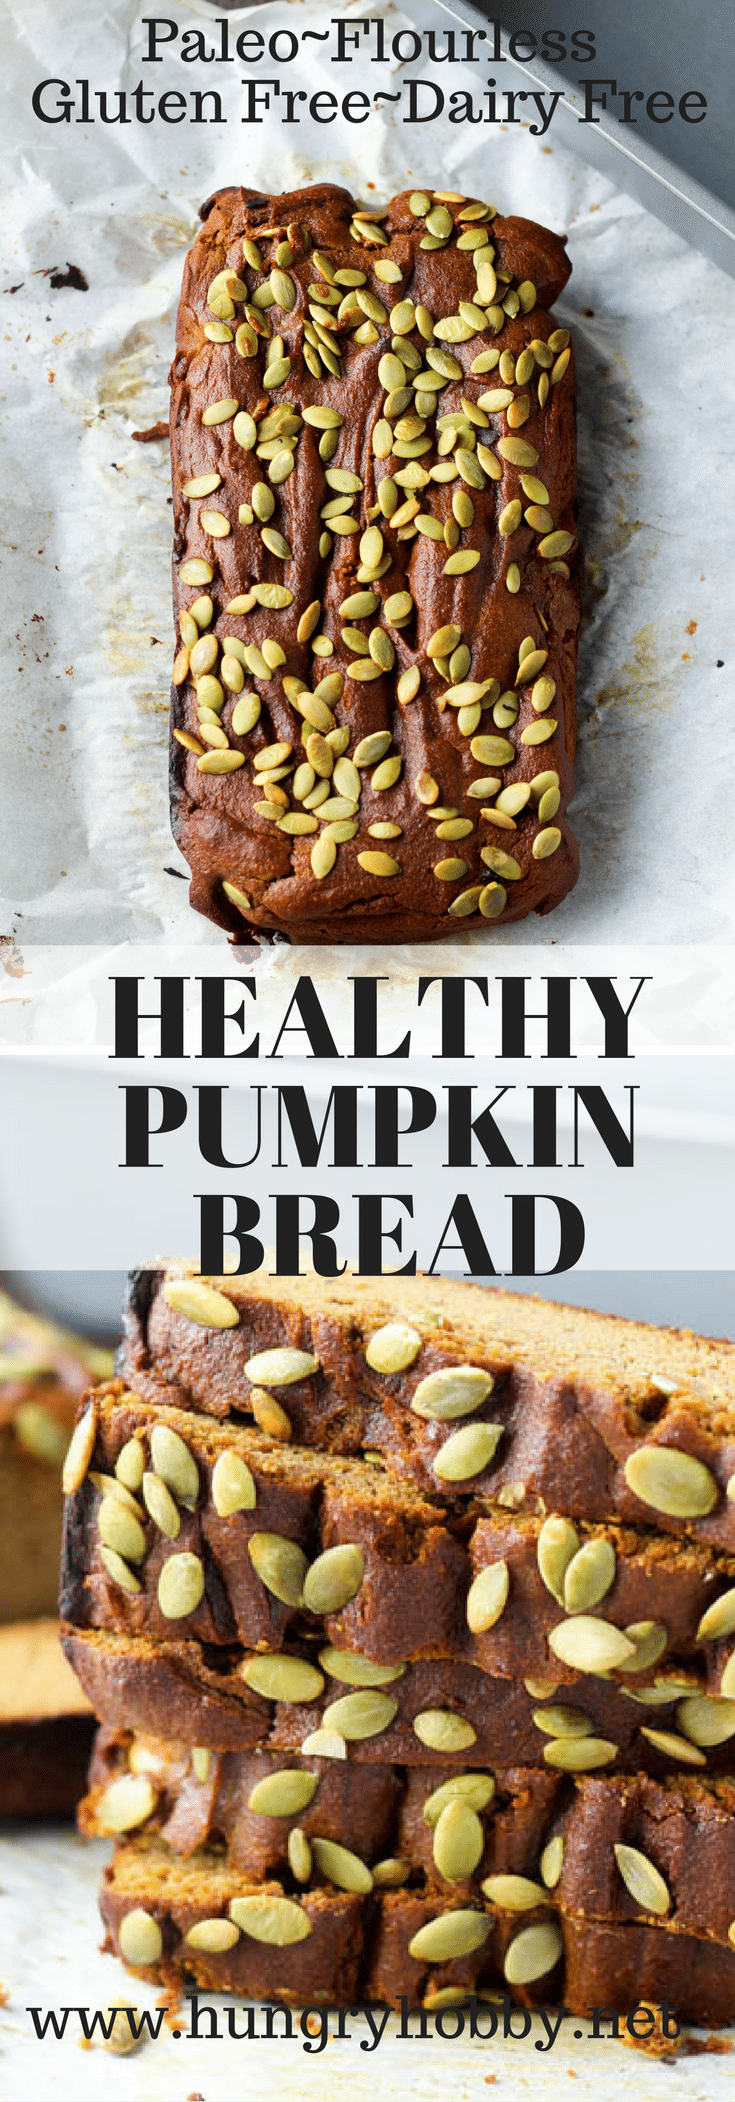 Healthy Pumpkin Bread Flourless Paleo Gluten Free and Dairy Free